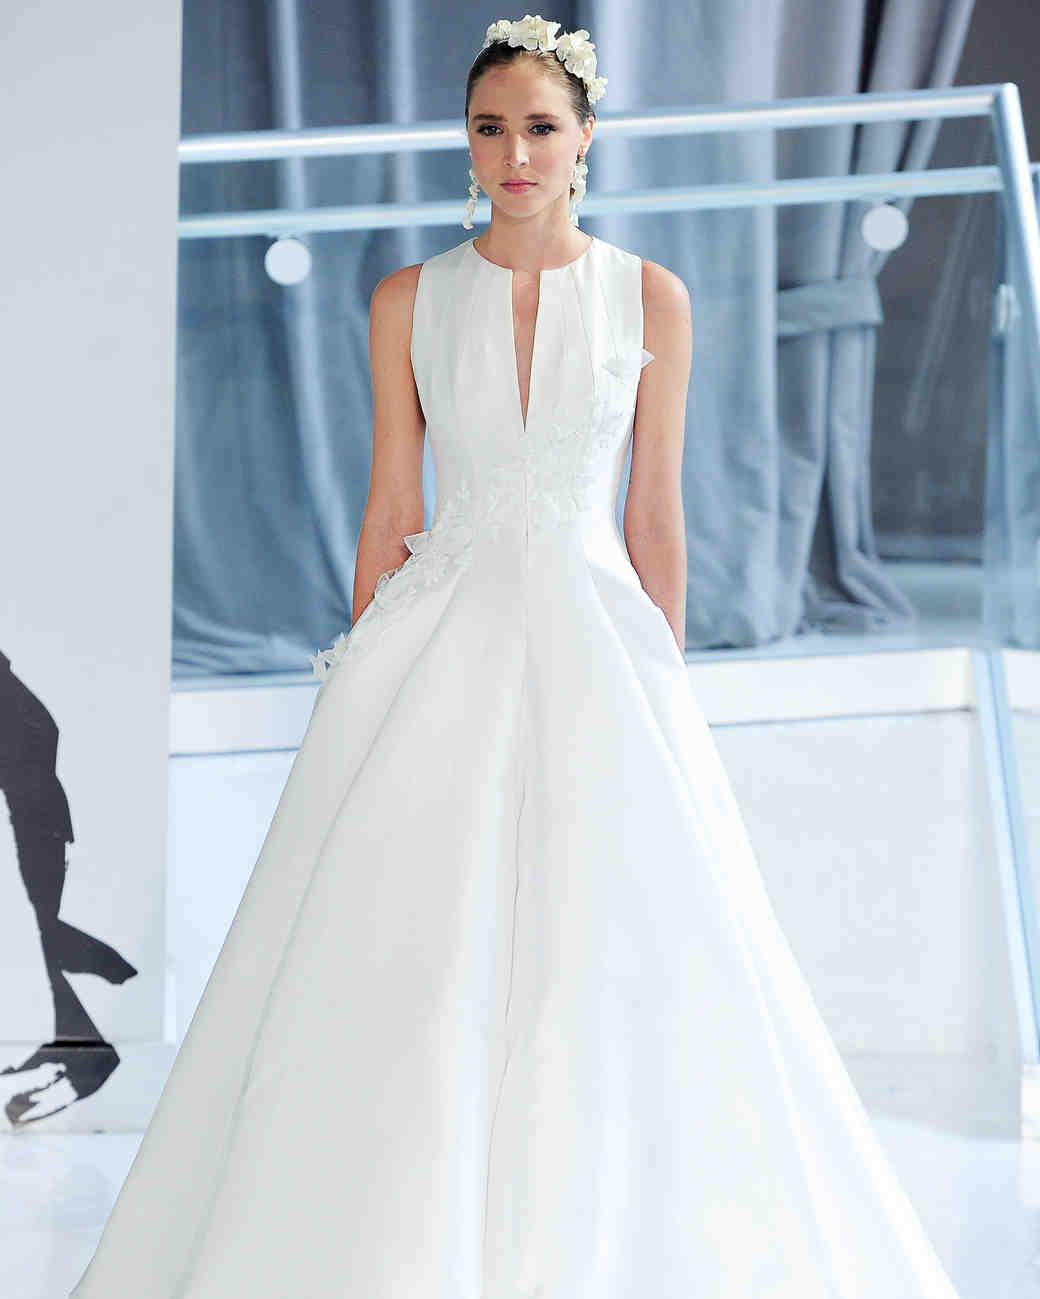 Christian Dior Short Wedding Dress – Fashion dresses